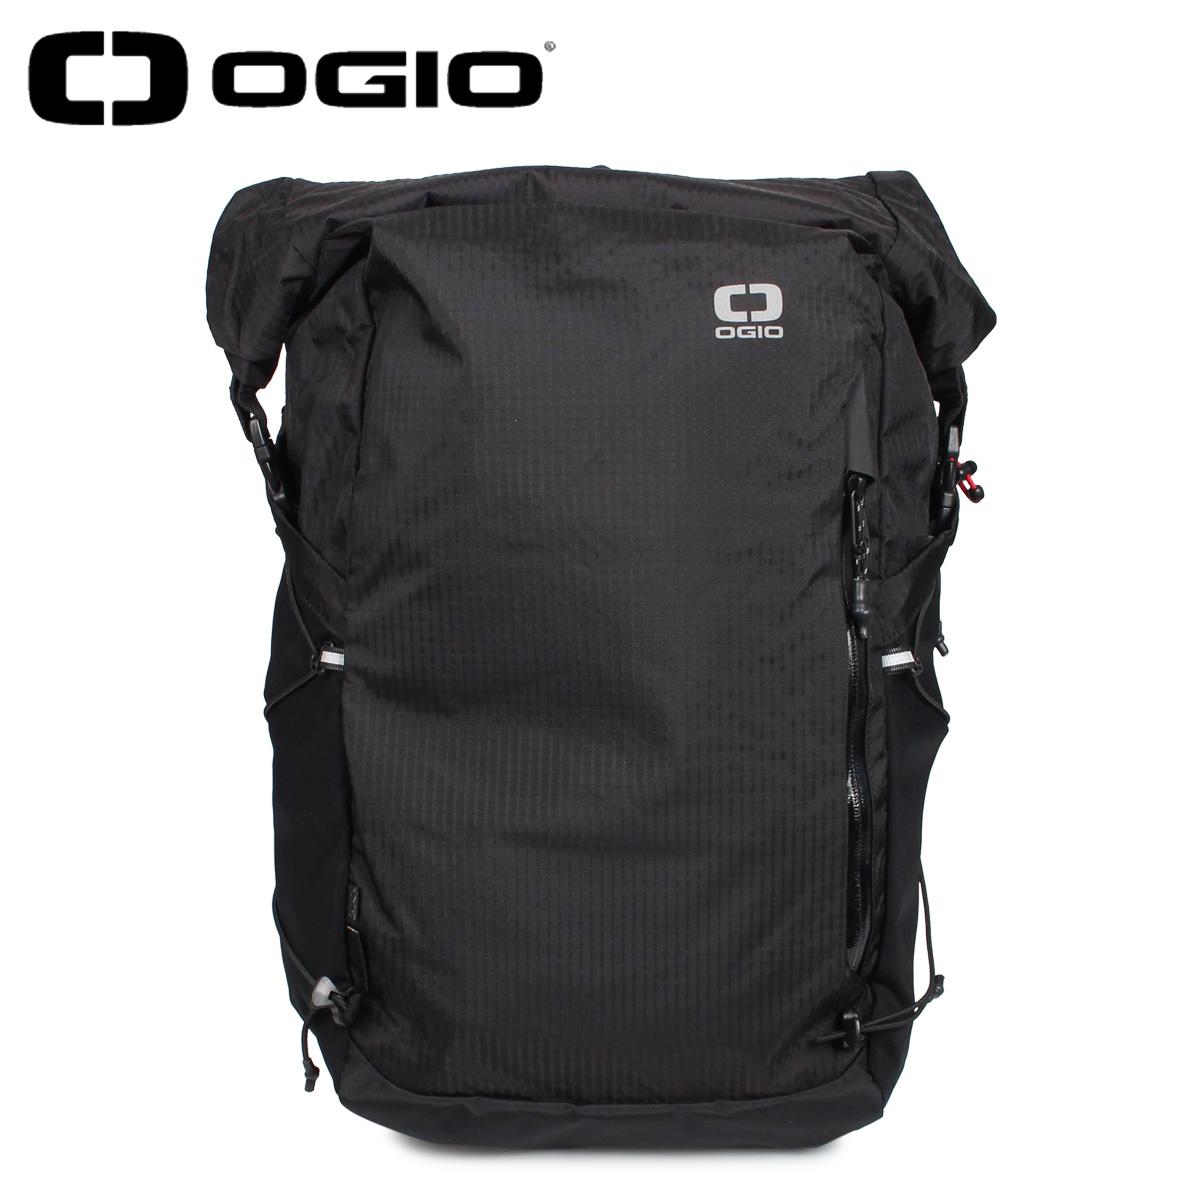 OGIO オジオ リュック バッグ バックパック ビジネスバッグ メンズ レディース 25L FUSE 25 ROLLTOP BACKPACK JV ブラック 黒 5920183OG